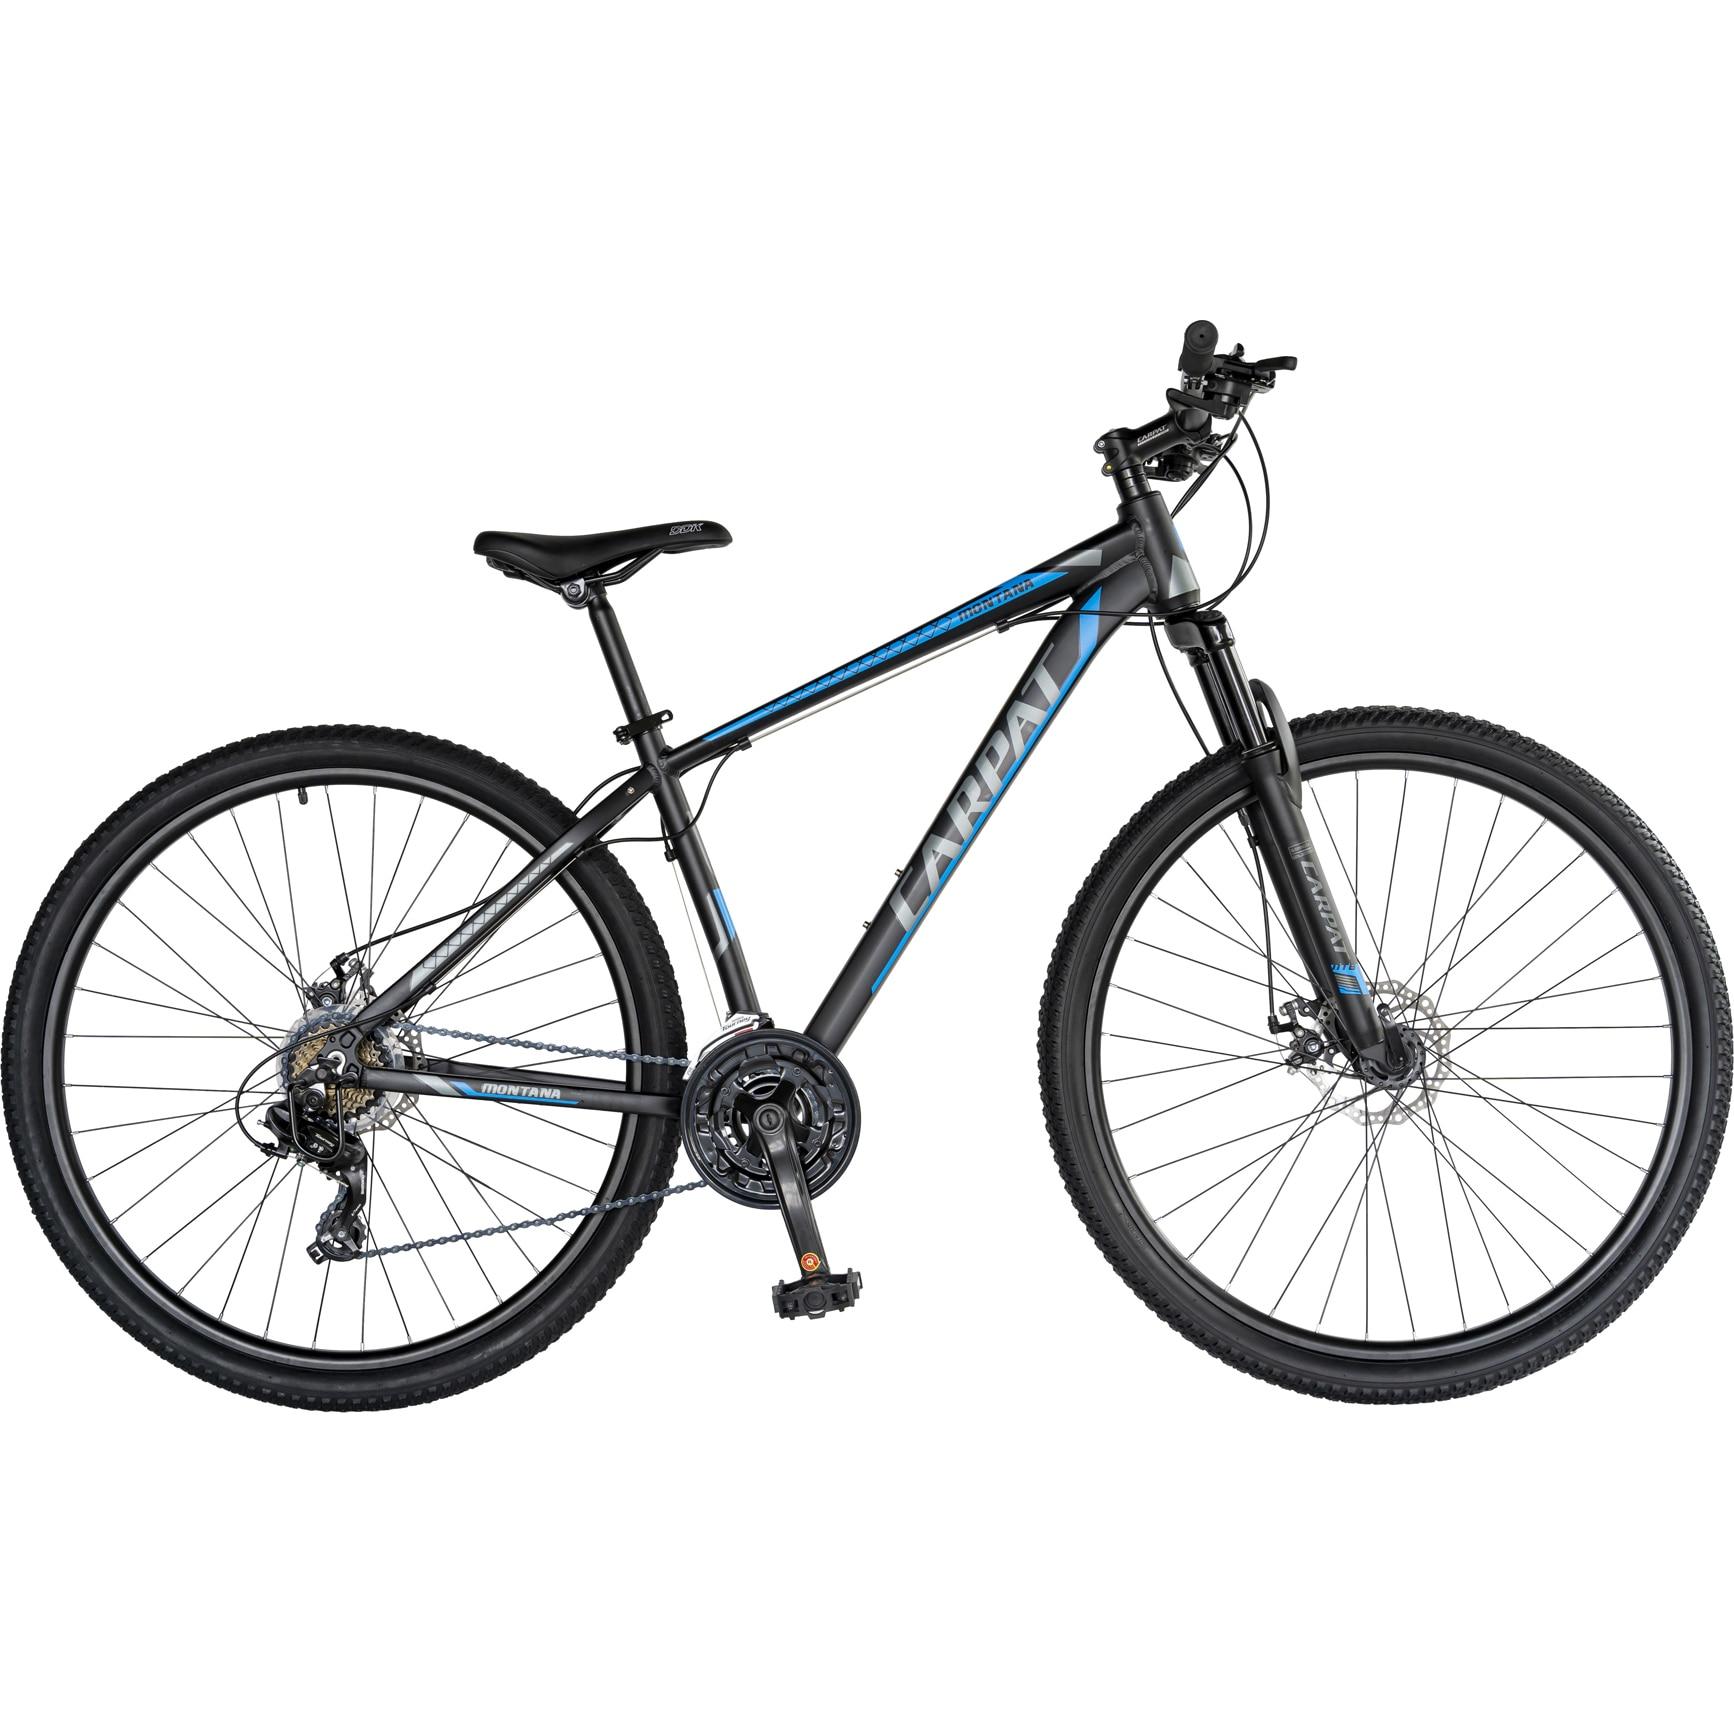 "Fotografie Bicicleta MTB 29"" Carpat C2970C, Negru/Albastru"